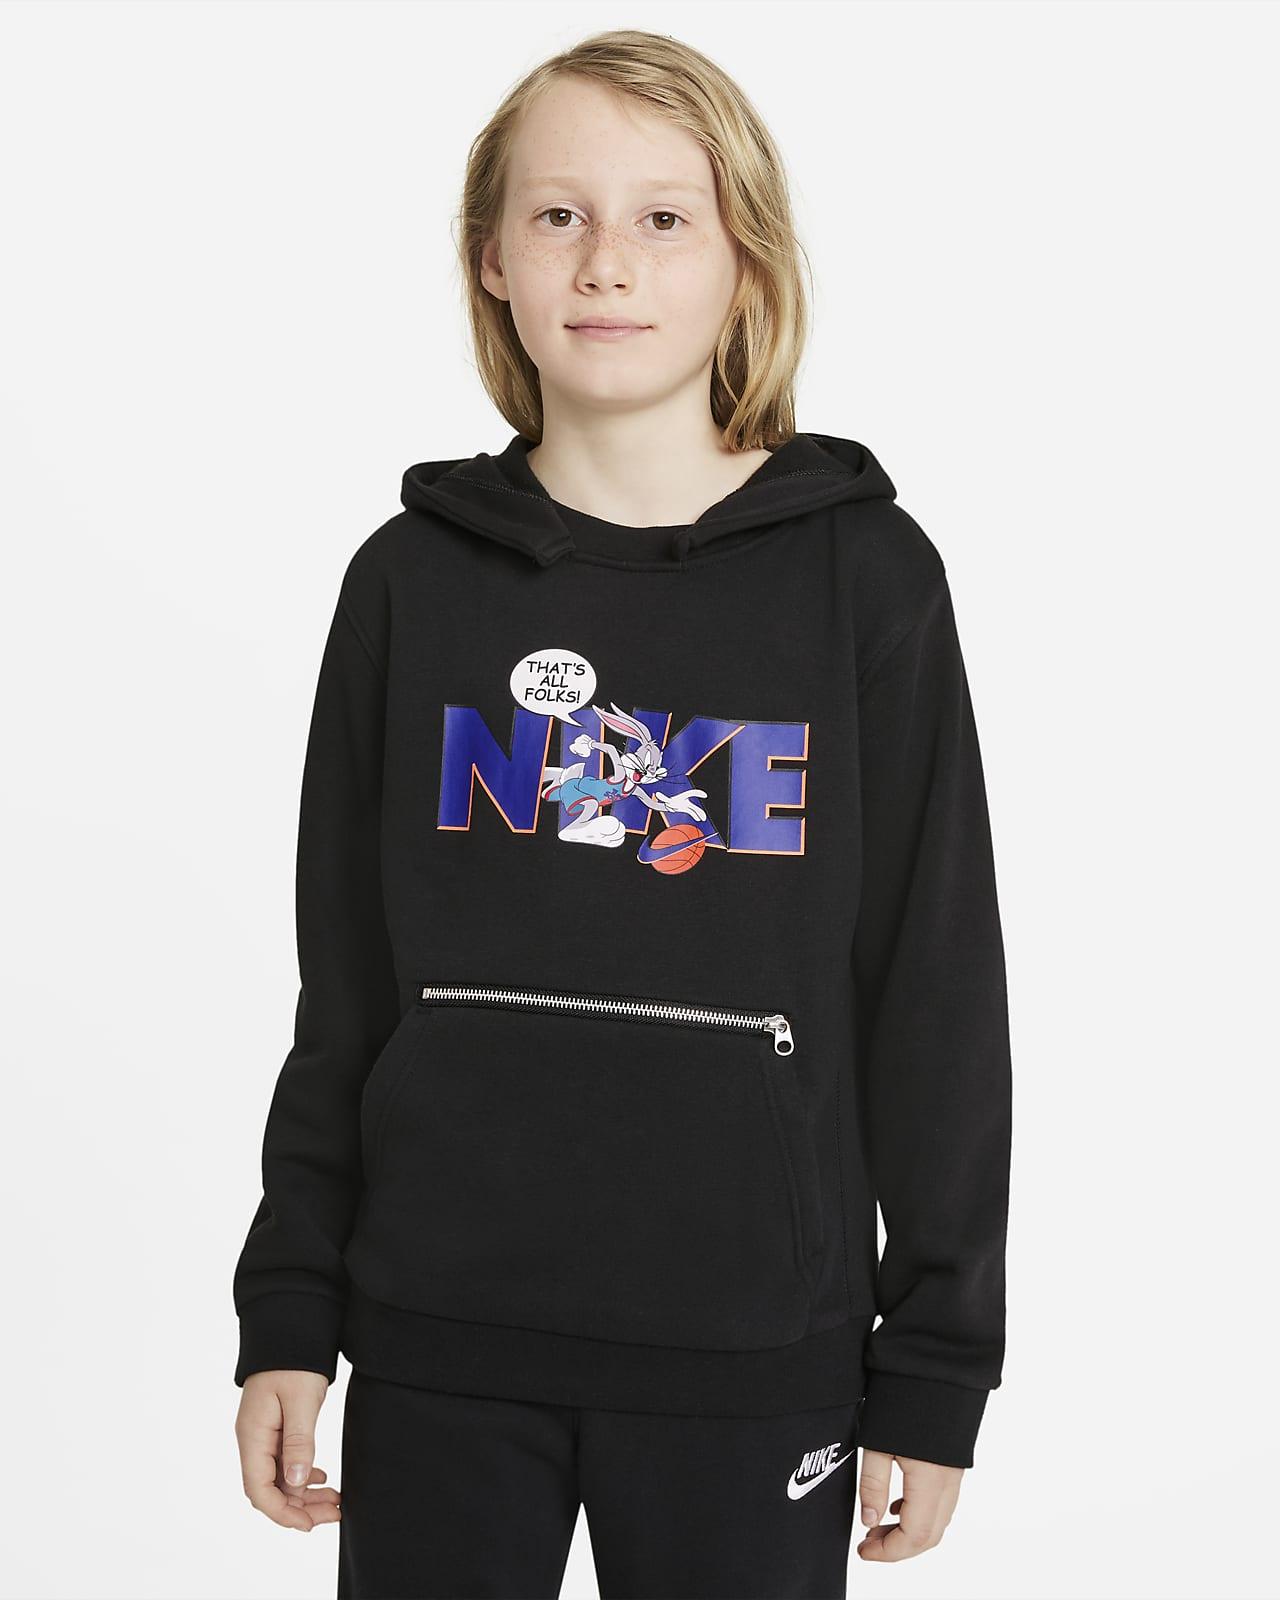 Nike Dri-FIT x Space Jam: A New Legacy Genç Çocuk Kapüşonlu Üstü